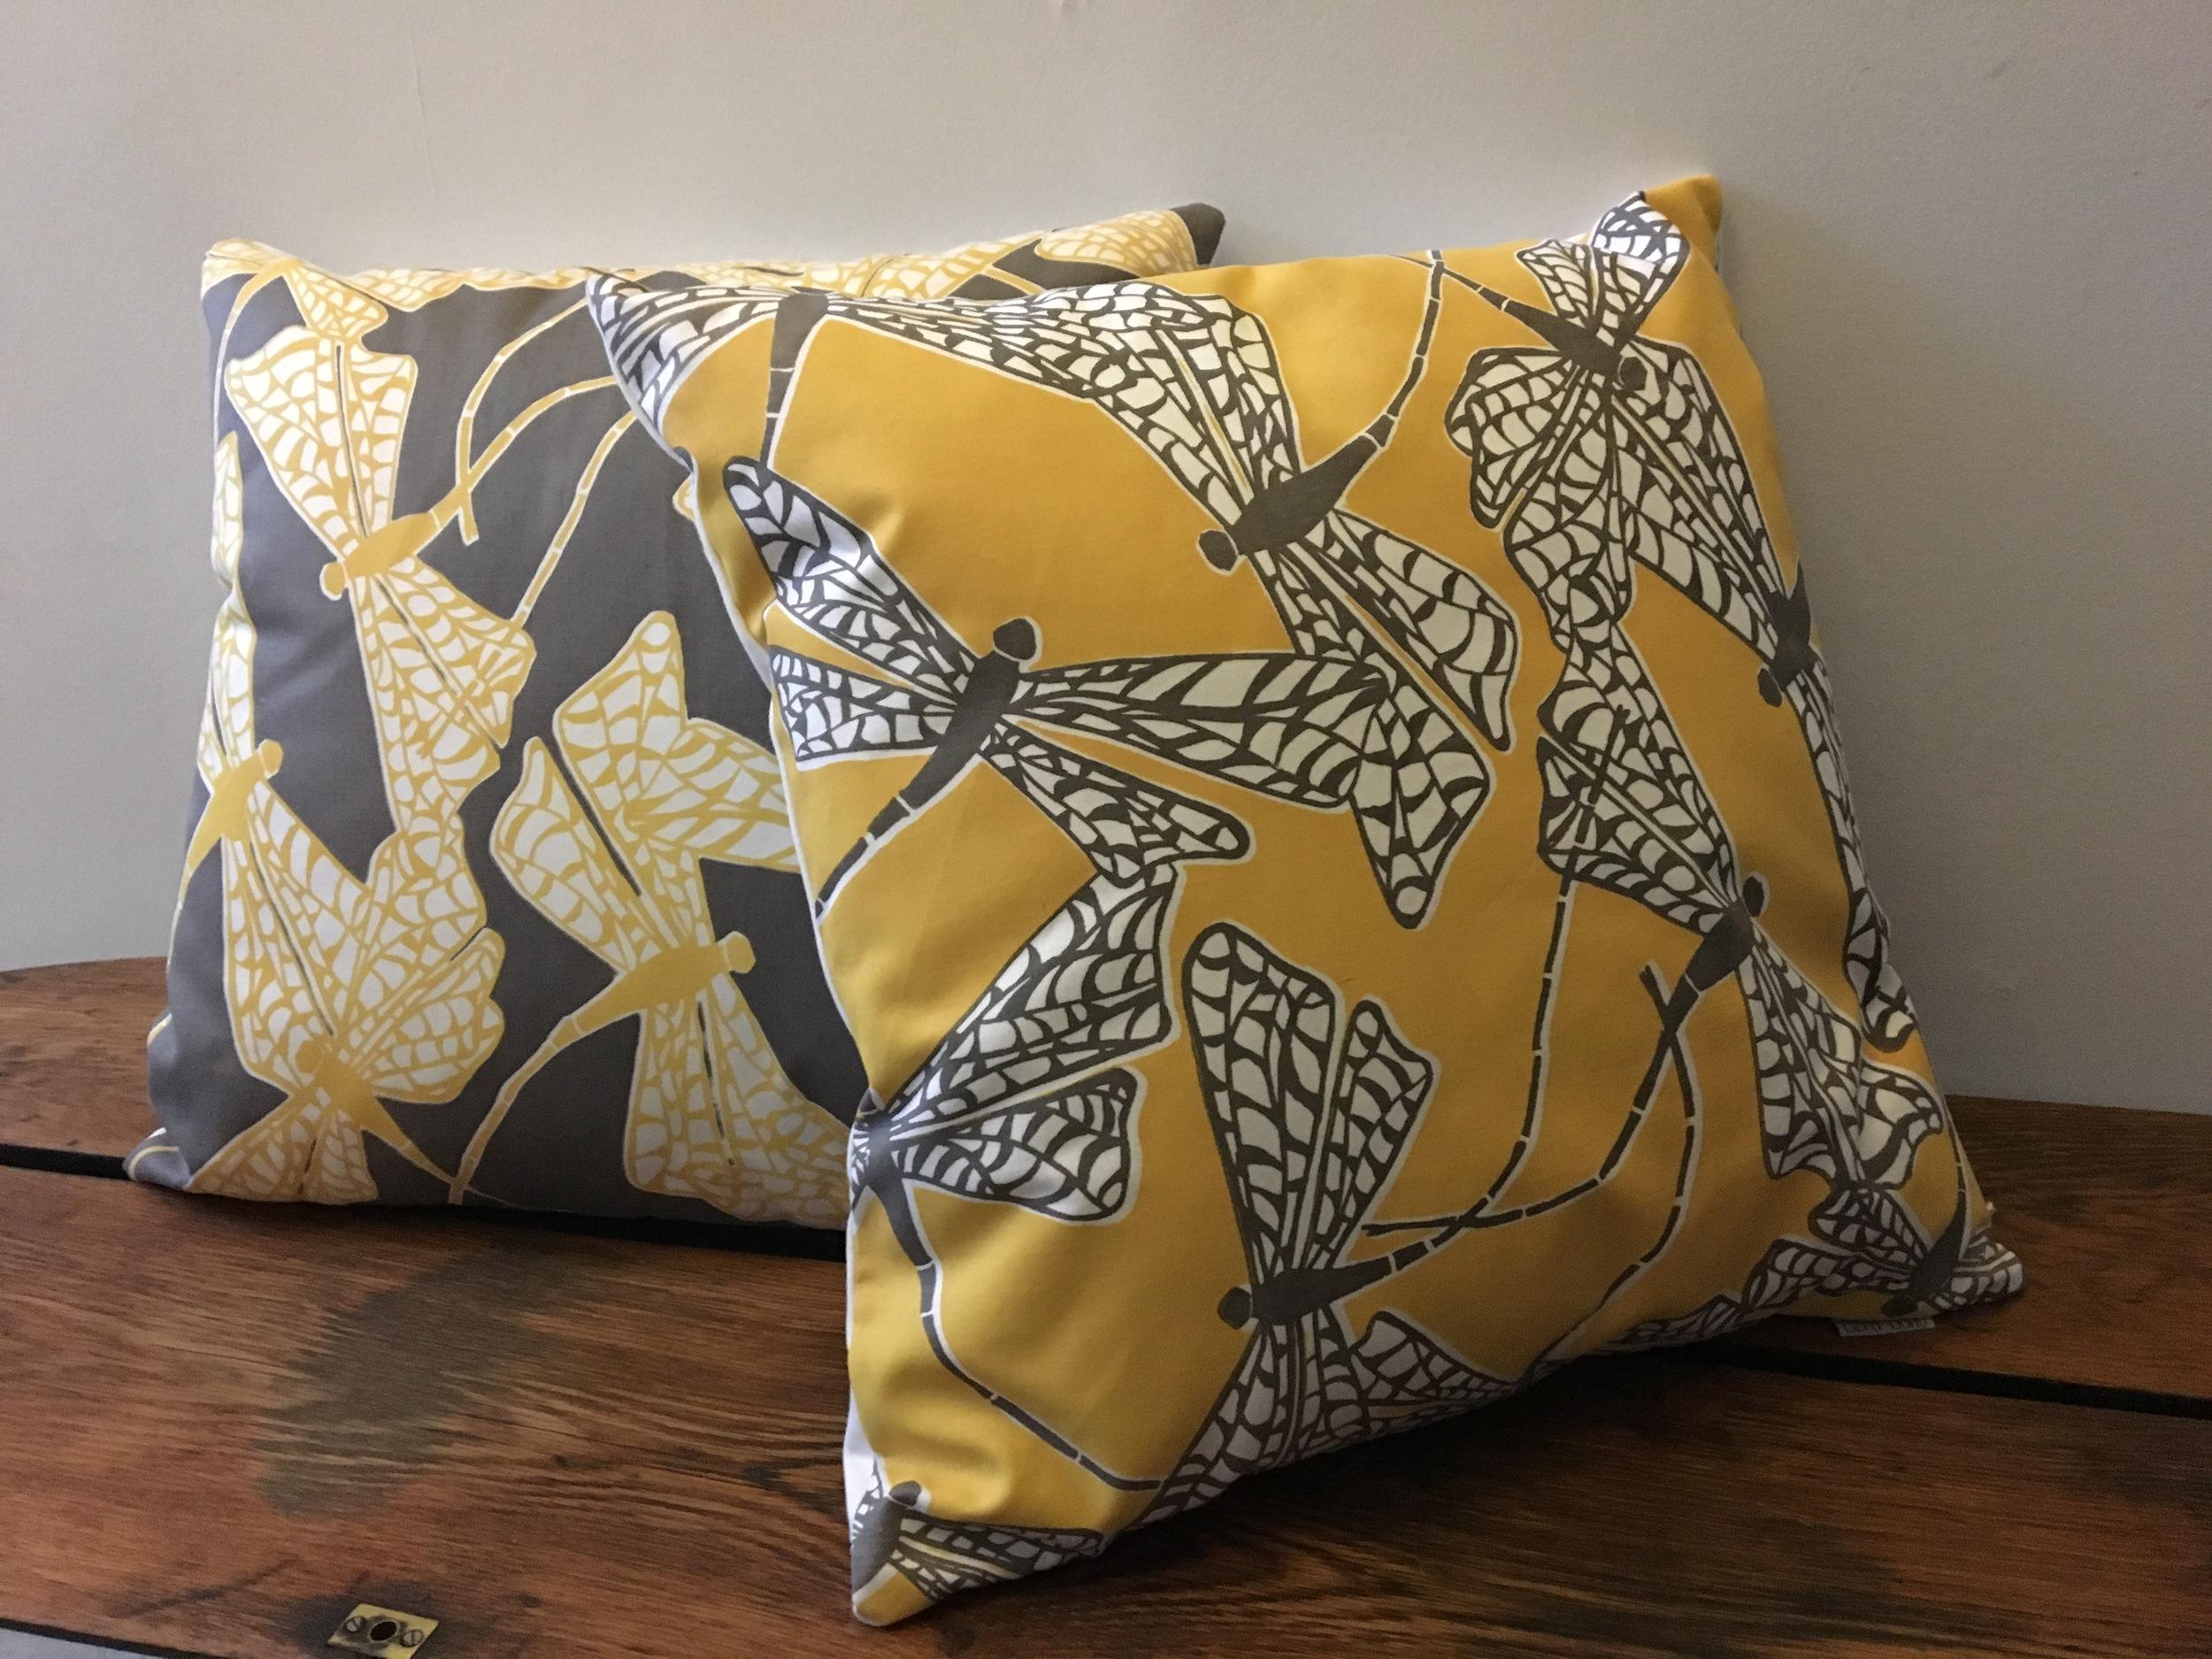 Dancing Dragonflies cushion